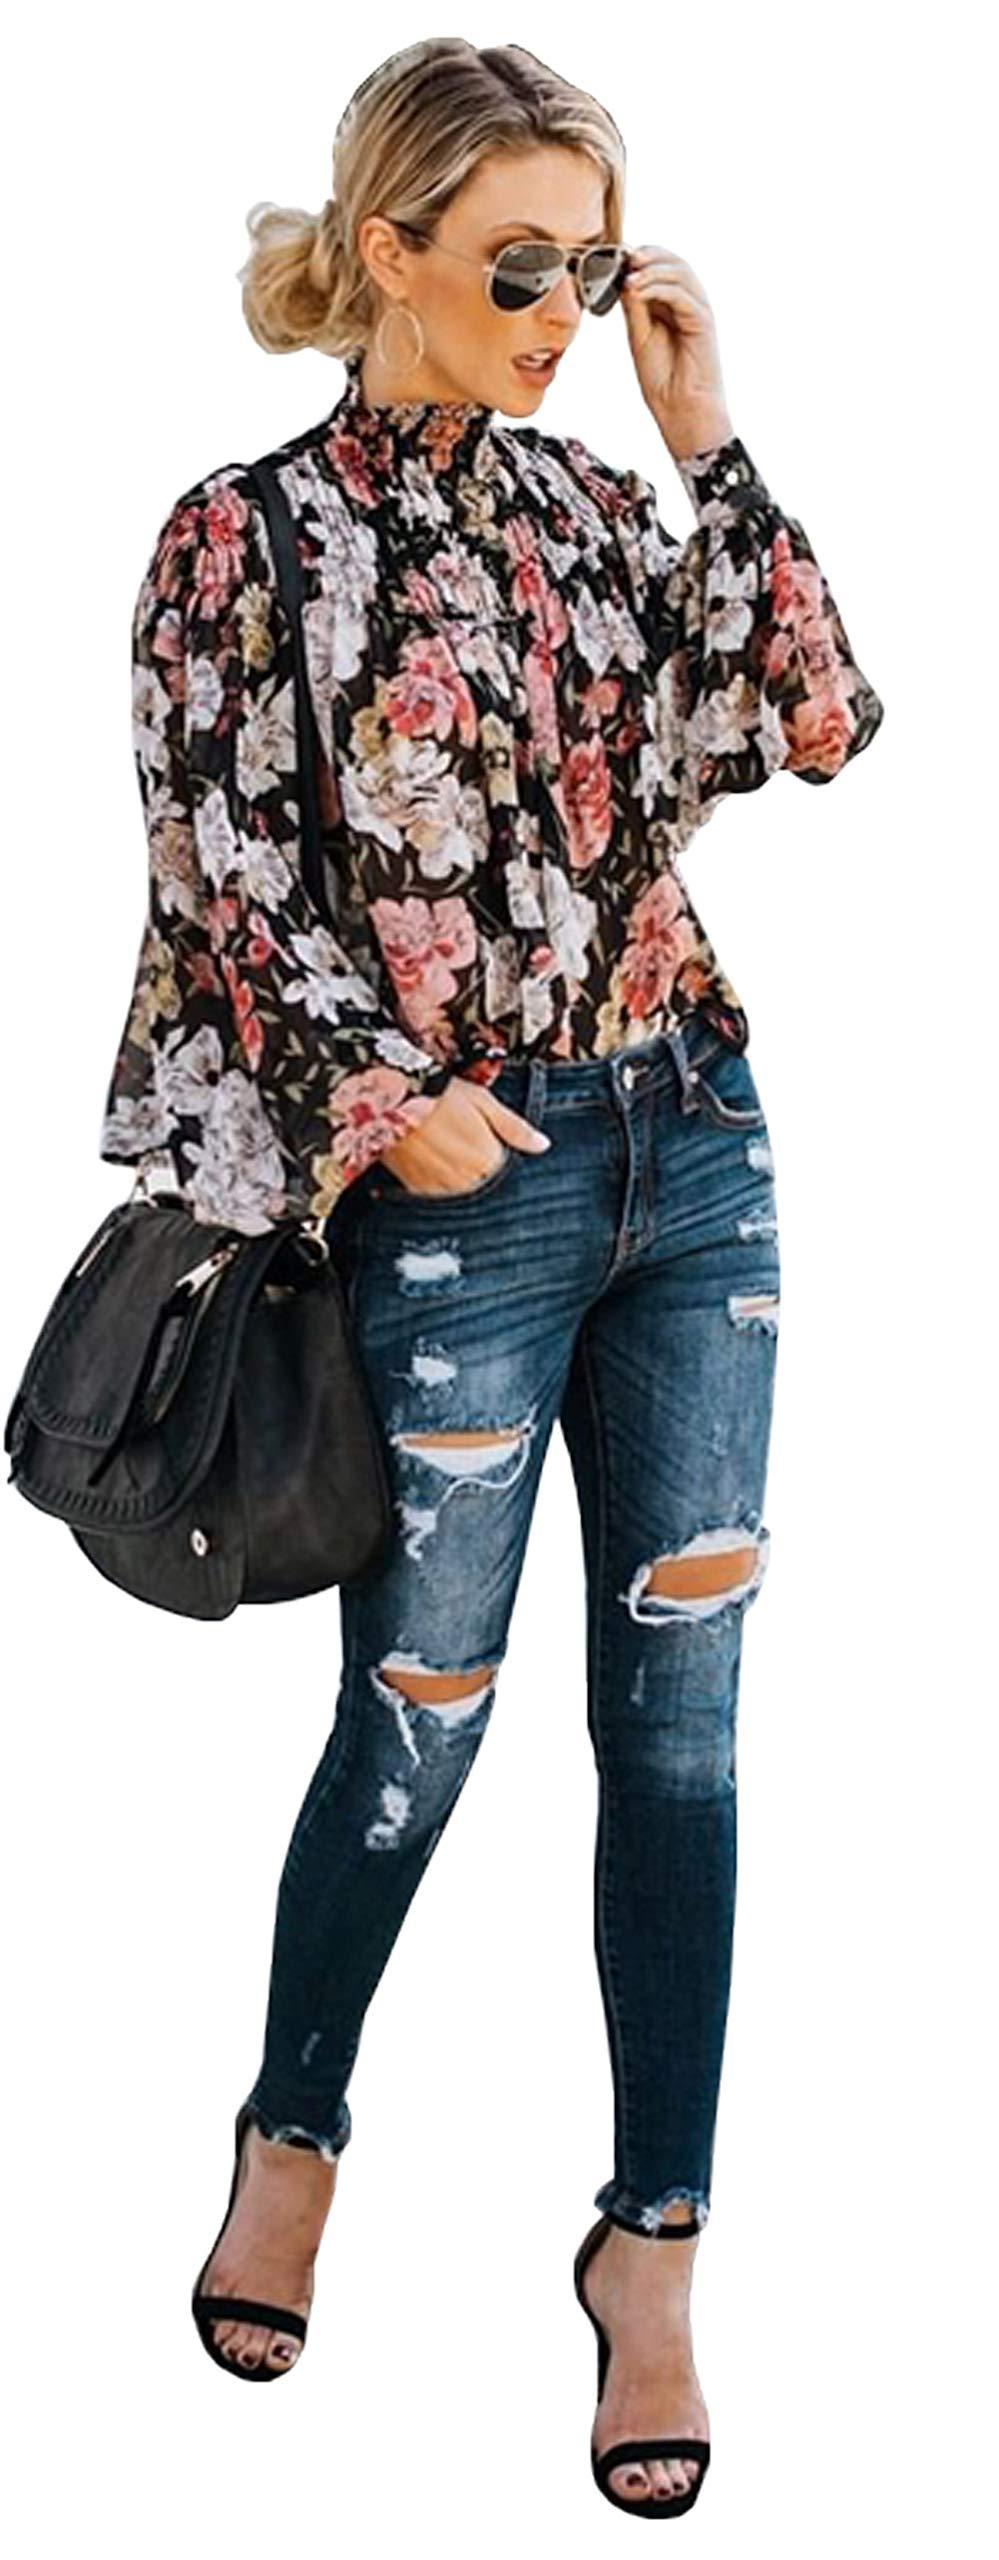 Longwu Women Sexy Ruffle High Neck Flower Printed Blouse Long Sleeve Loose Pullover Shirt Top